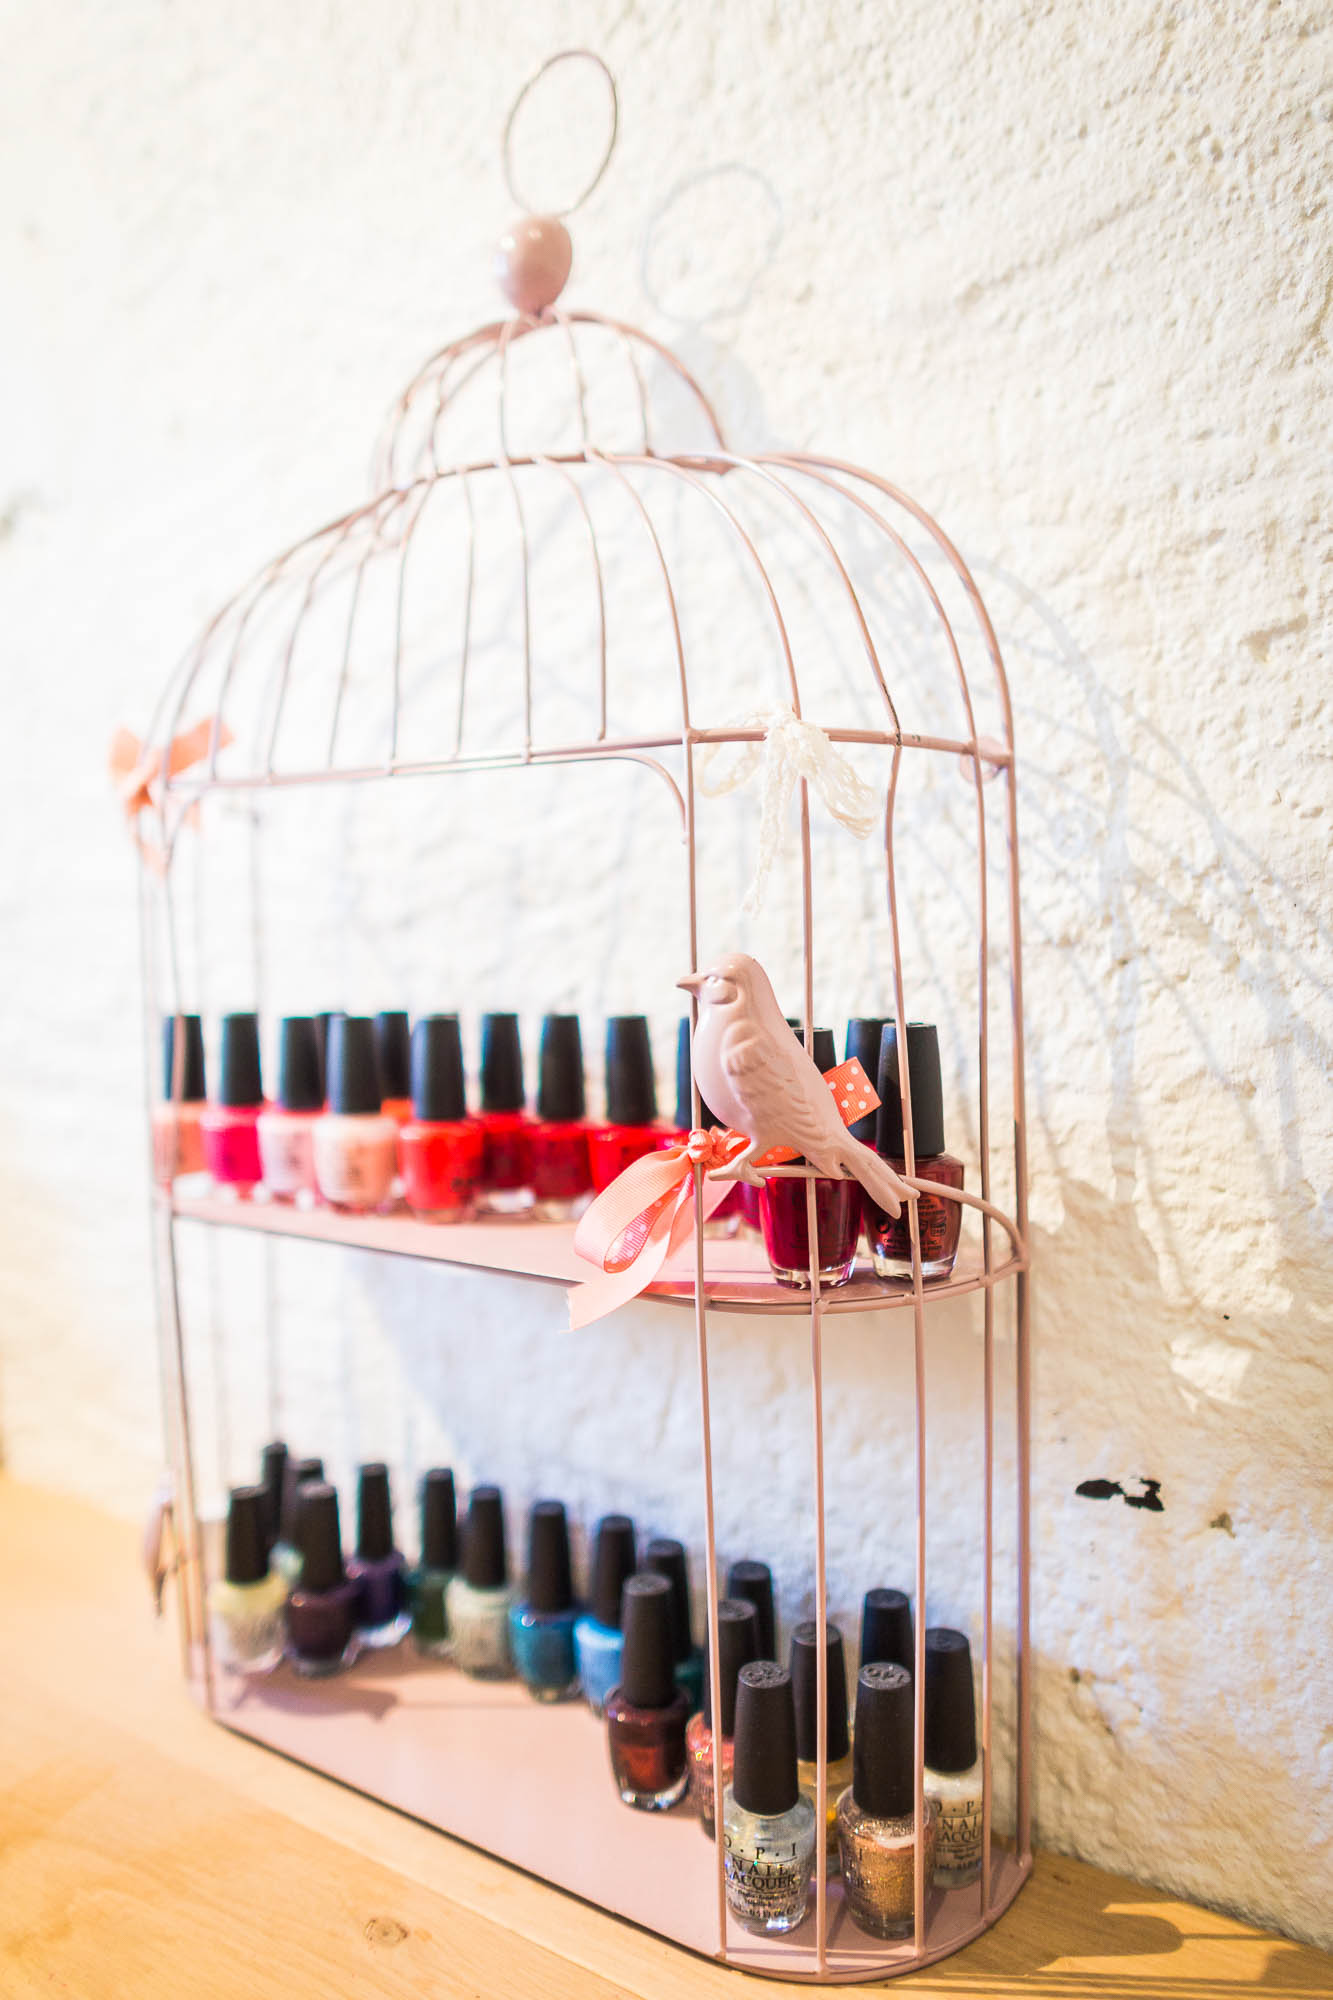 Les ongles de Marilyne